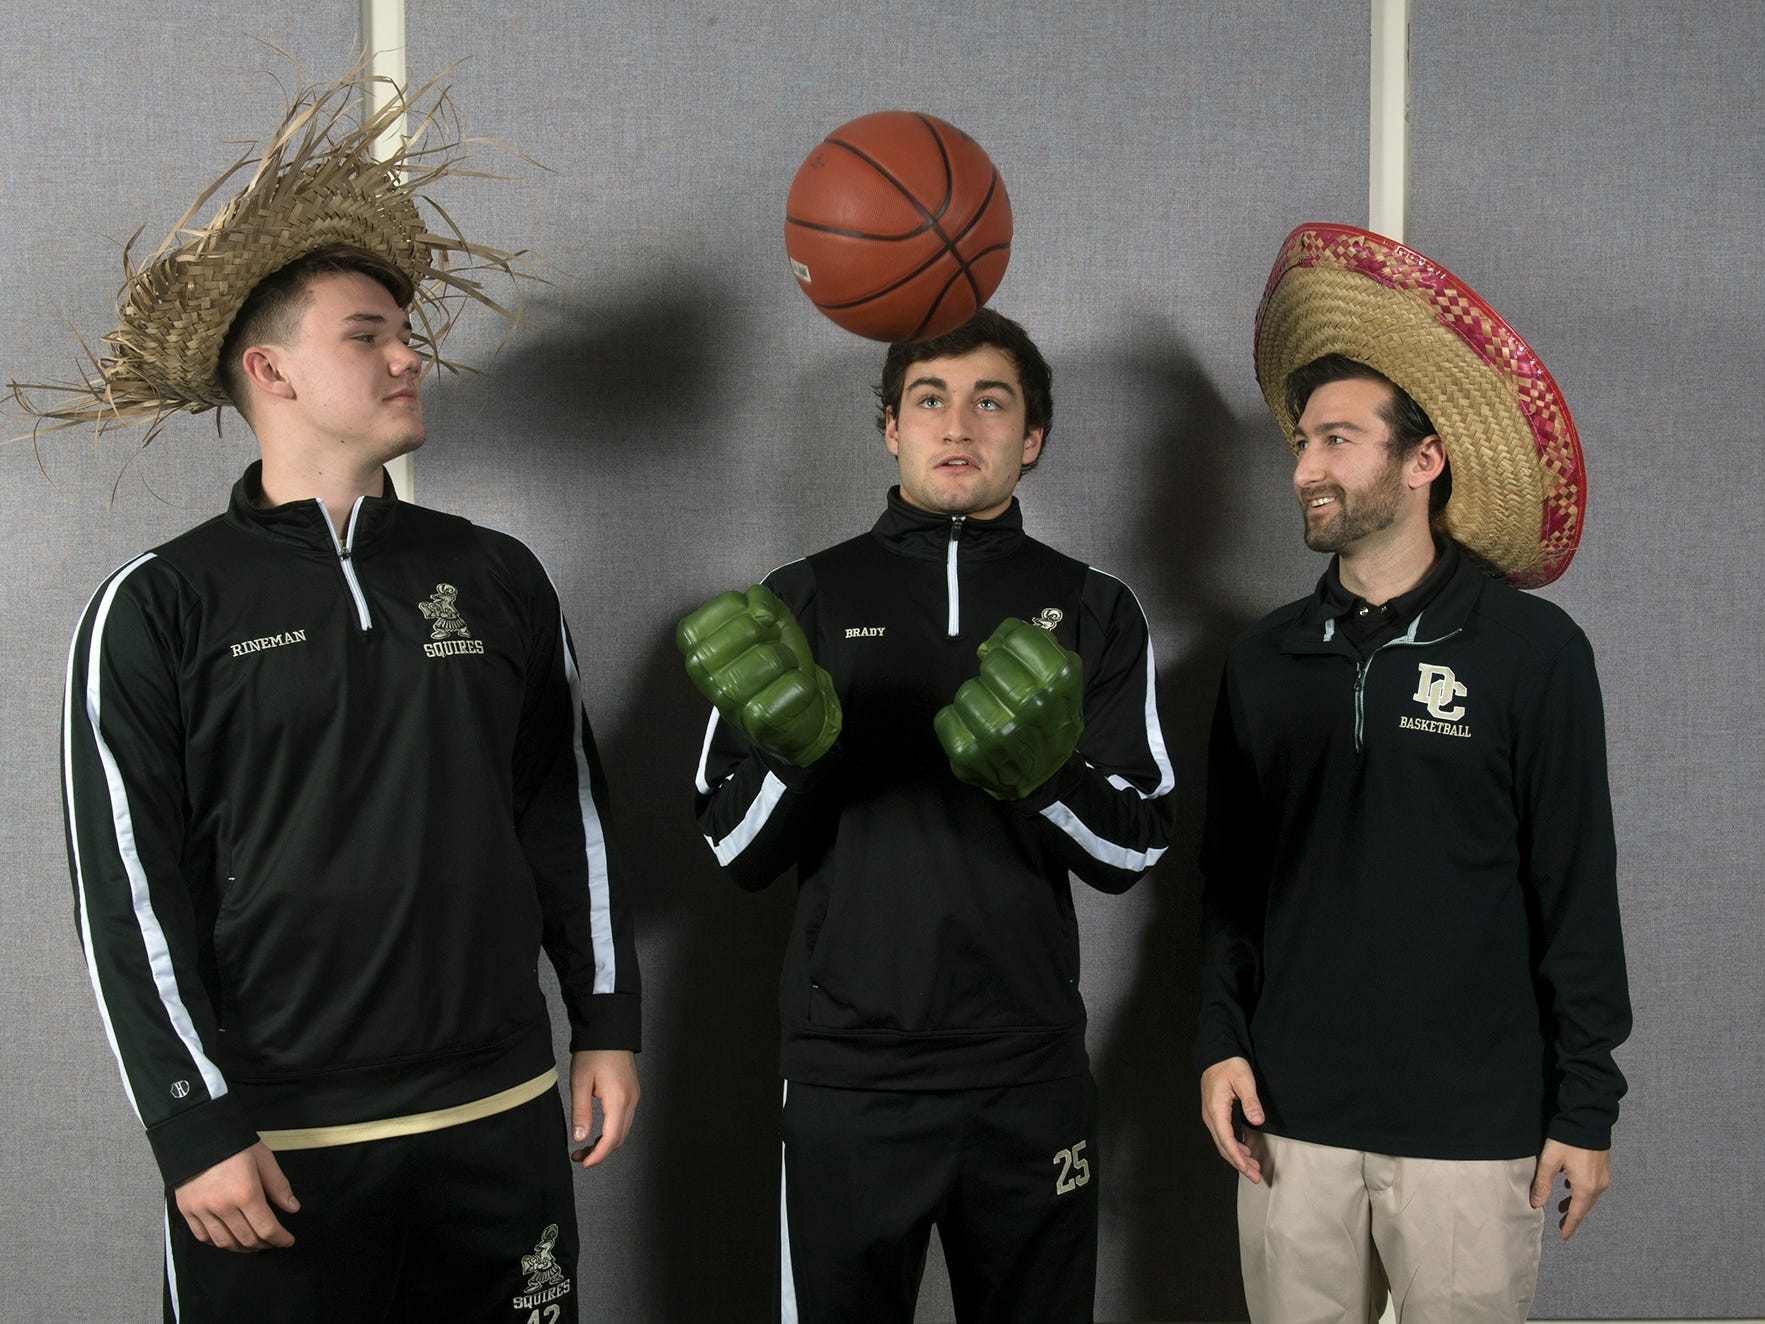 From the left, Matt Rineman, Evan Brady and Cory Brady, with the Delone Catholic basketball team, pose during the 2018-19 GameTimePa YAIAA Winter Media Day Sunday November 11, 2018.